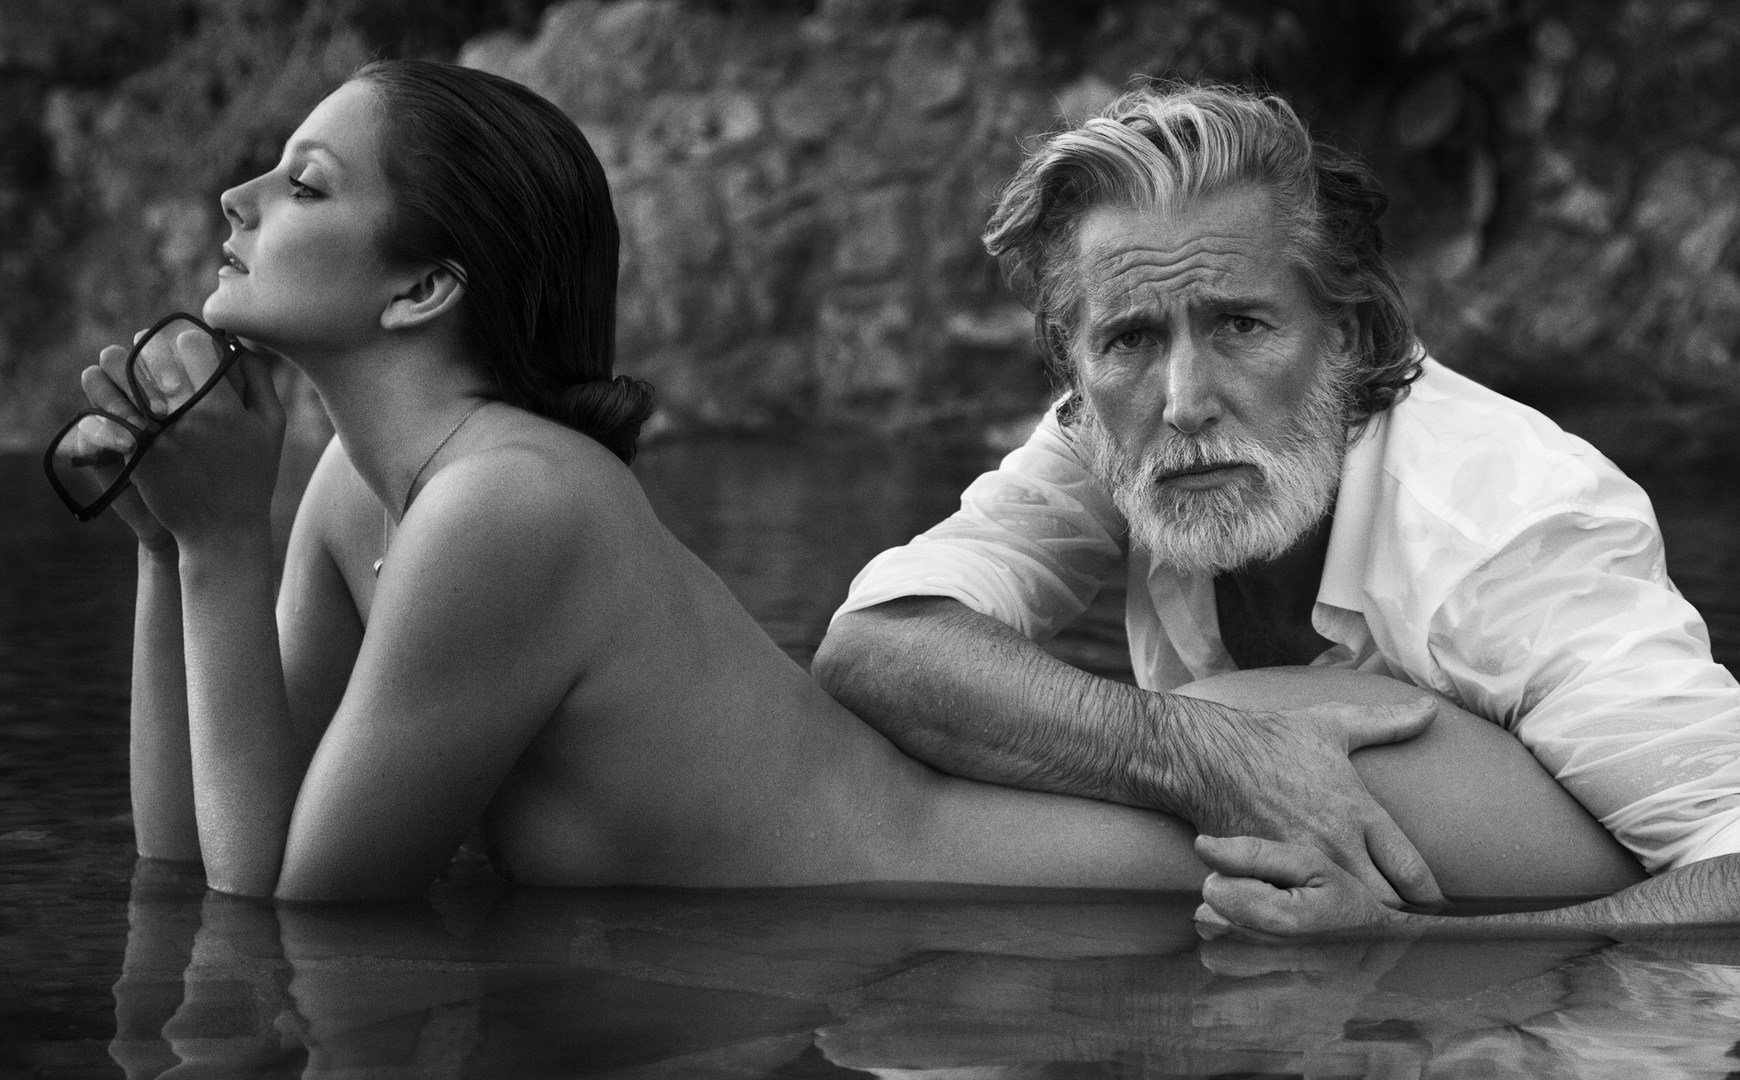 Старик с молодой любовницей фото 8 фотография